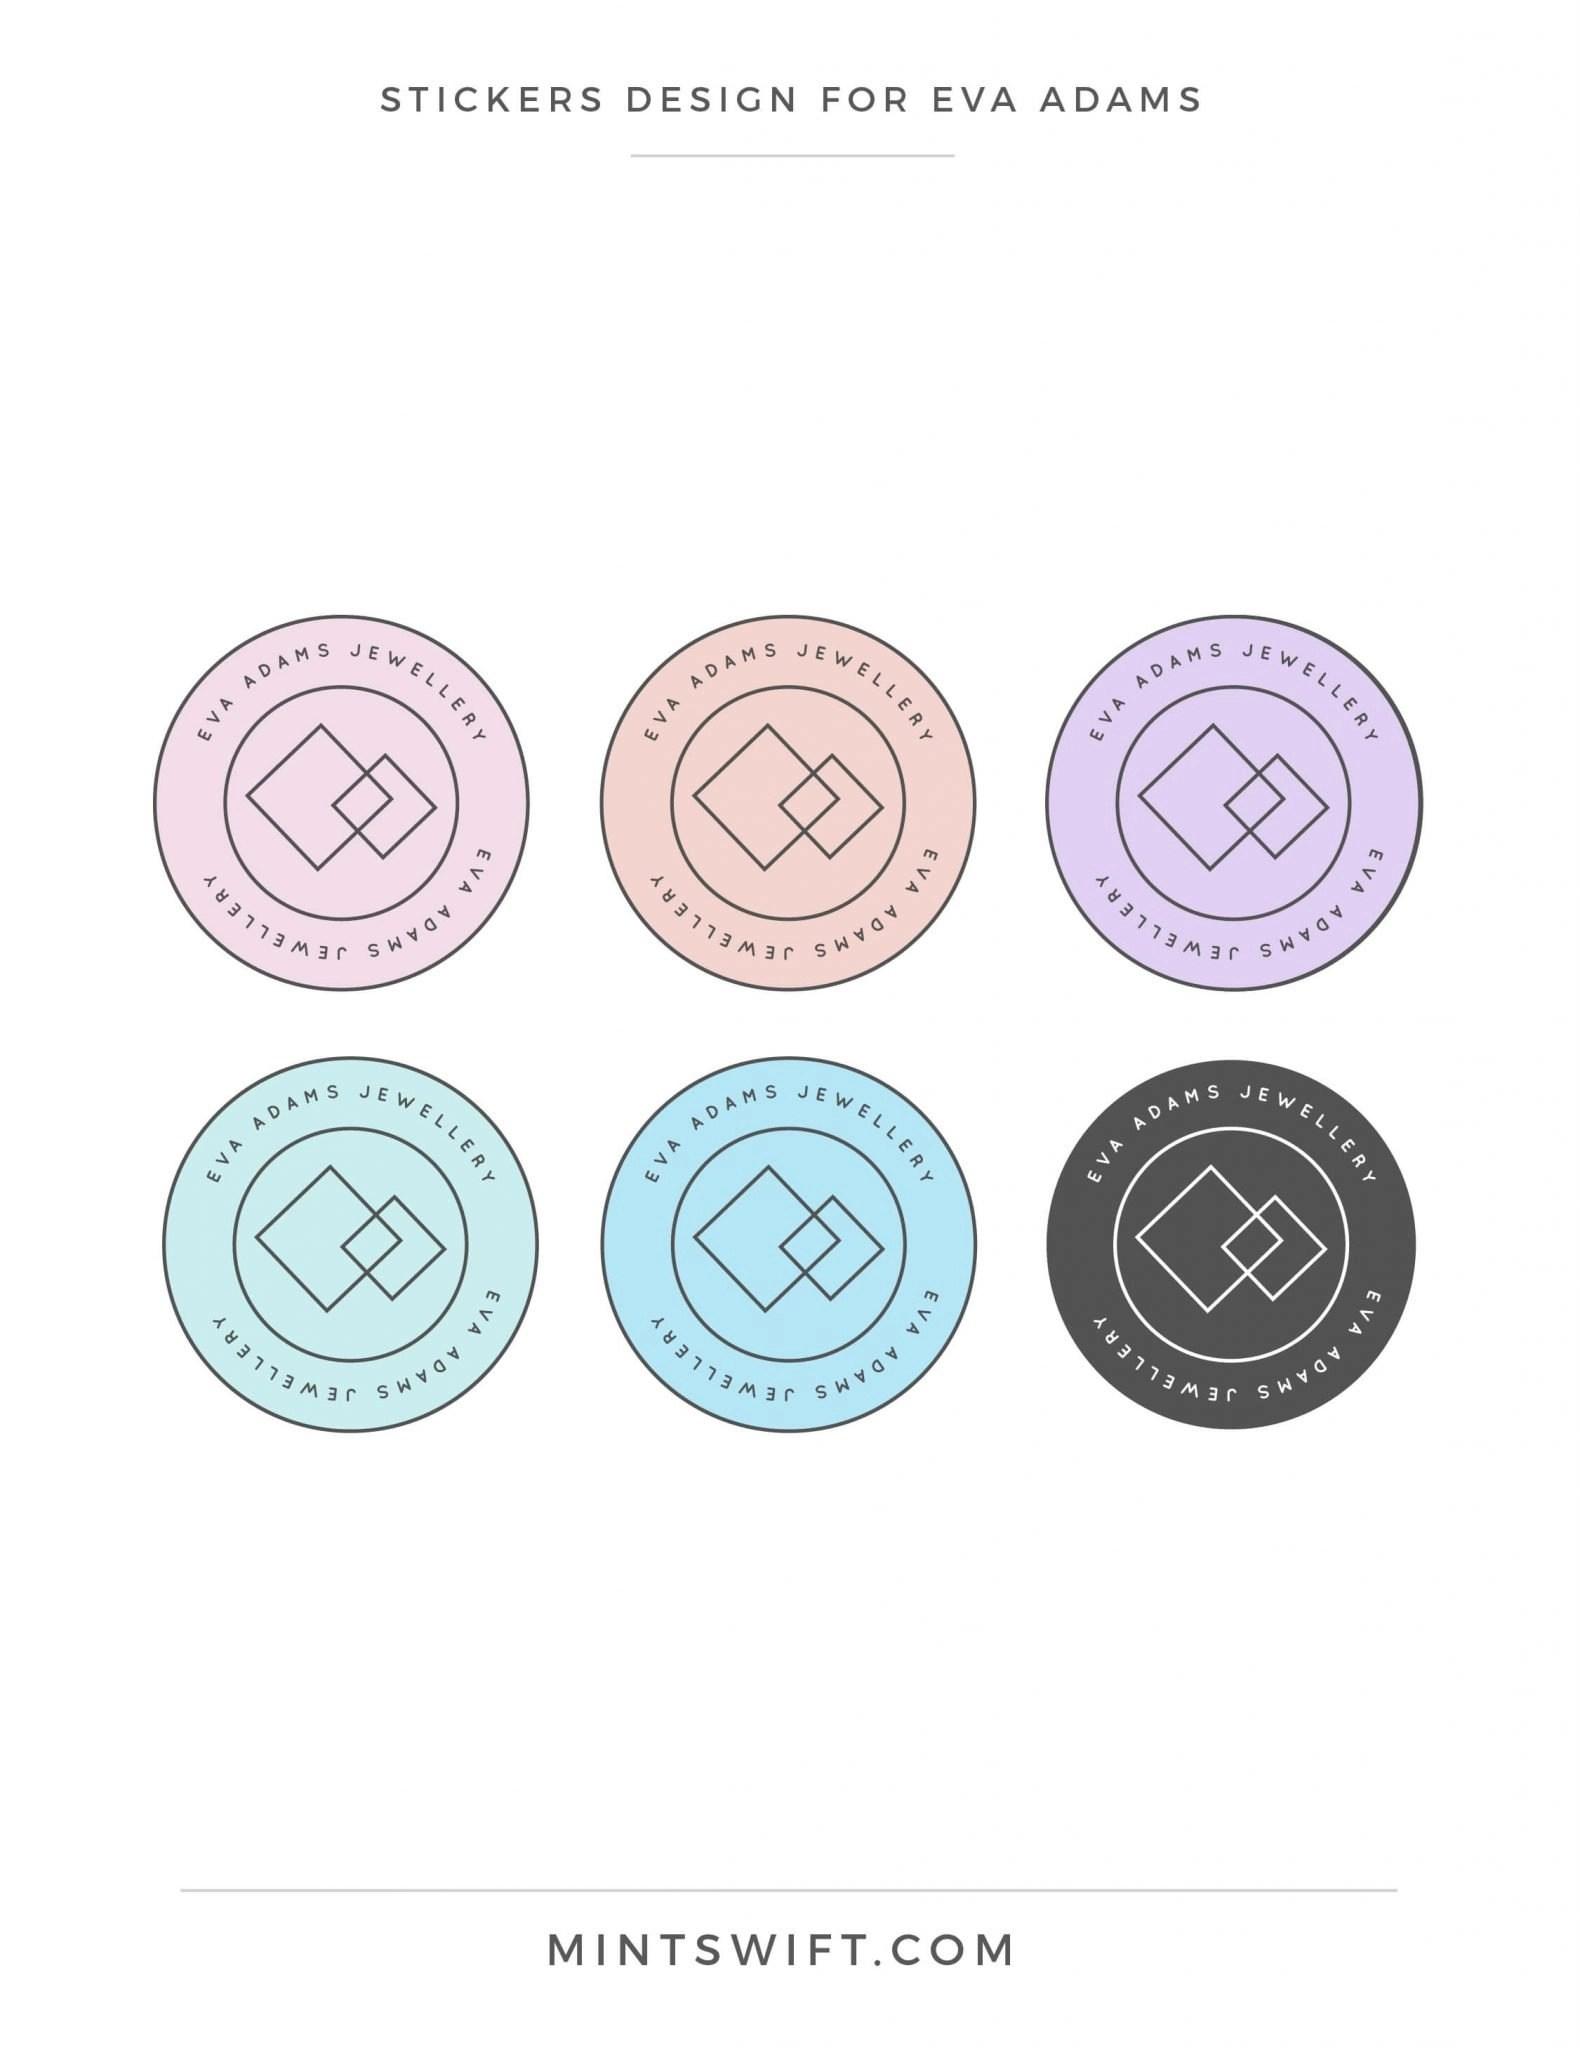 Eva Adams - Stickers design - MintSwift